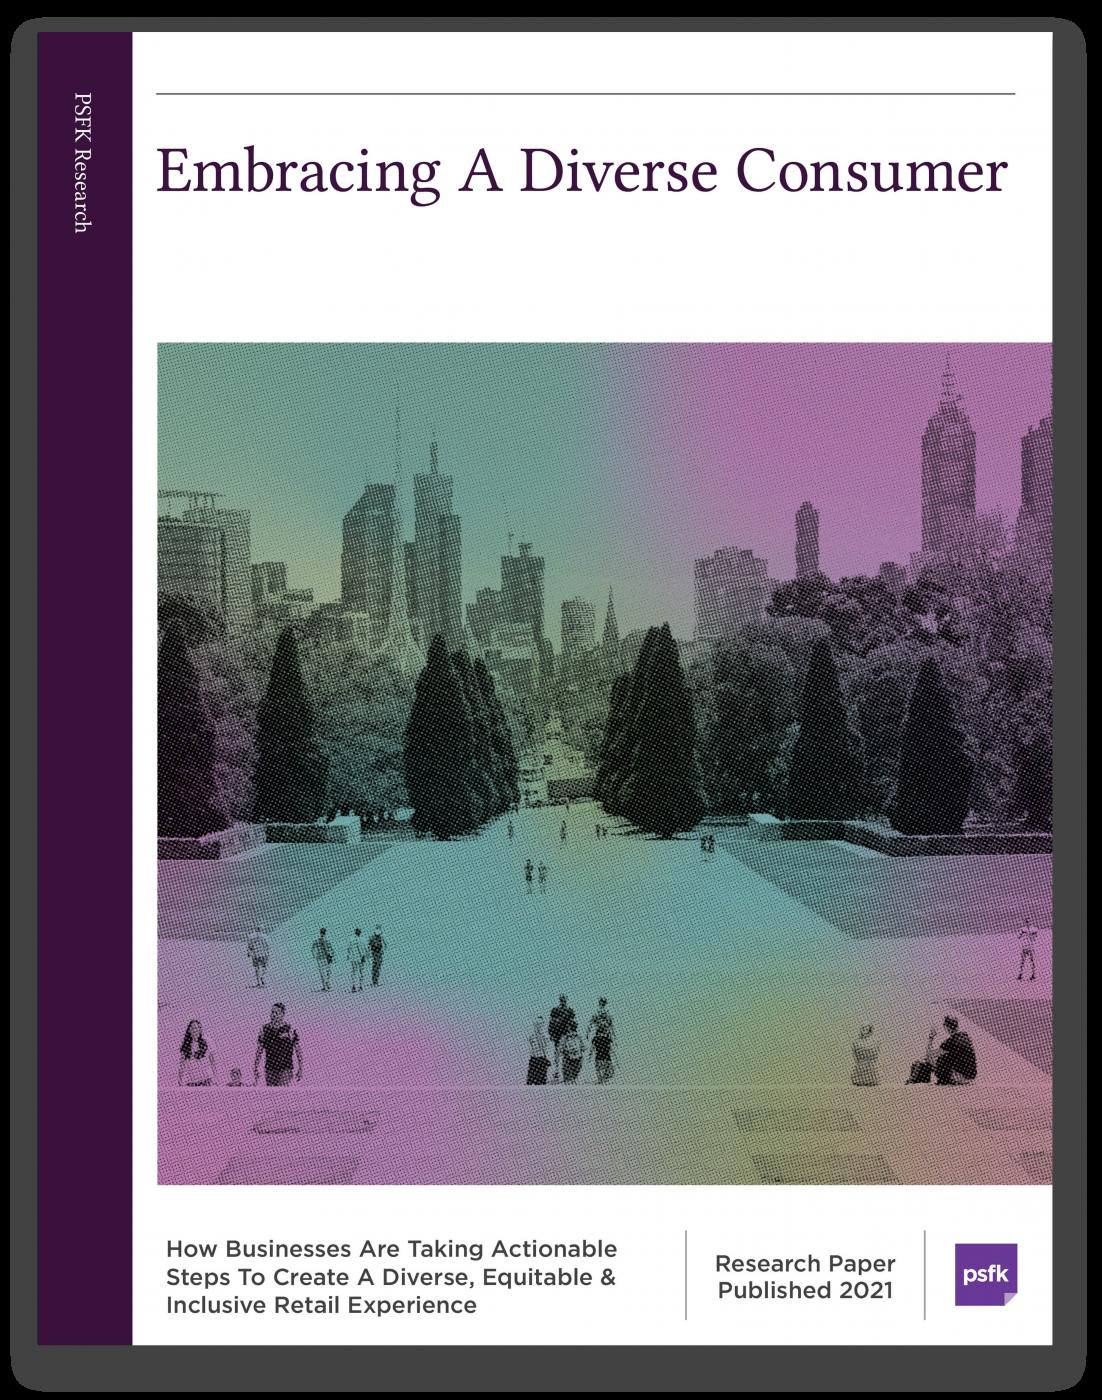 Embracing A Diverse Consumer